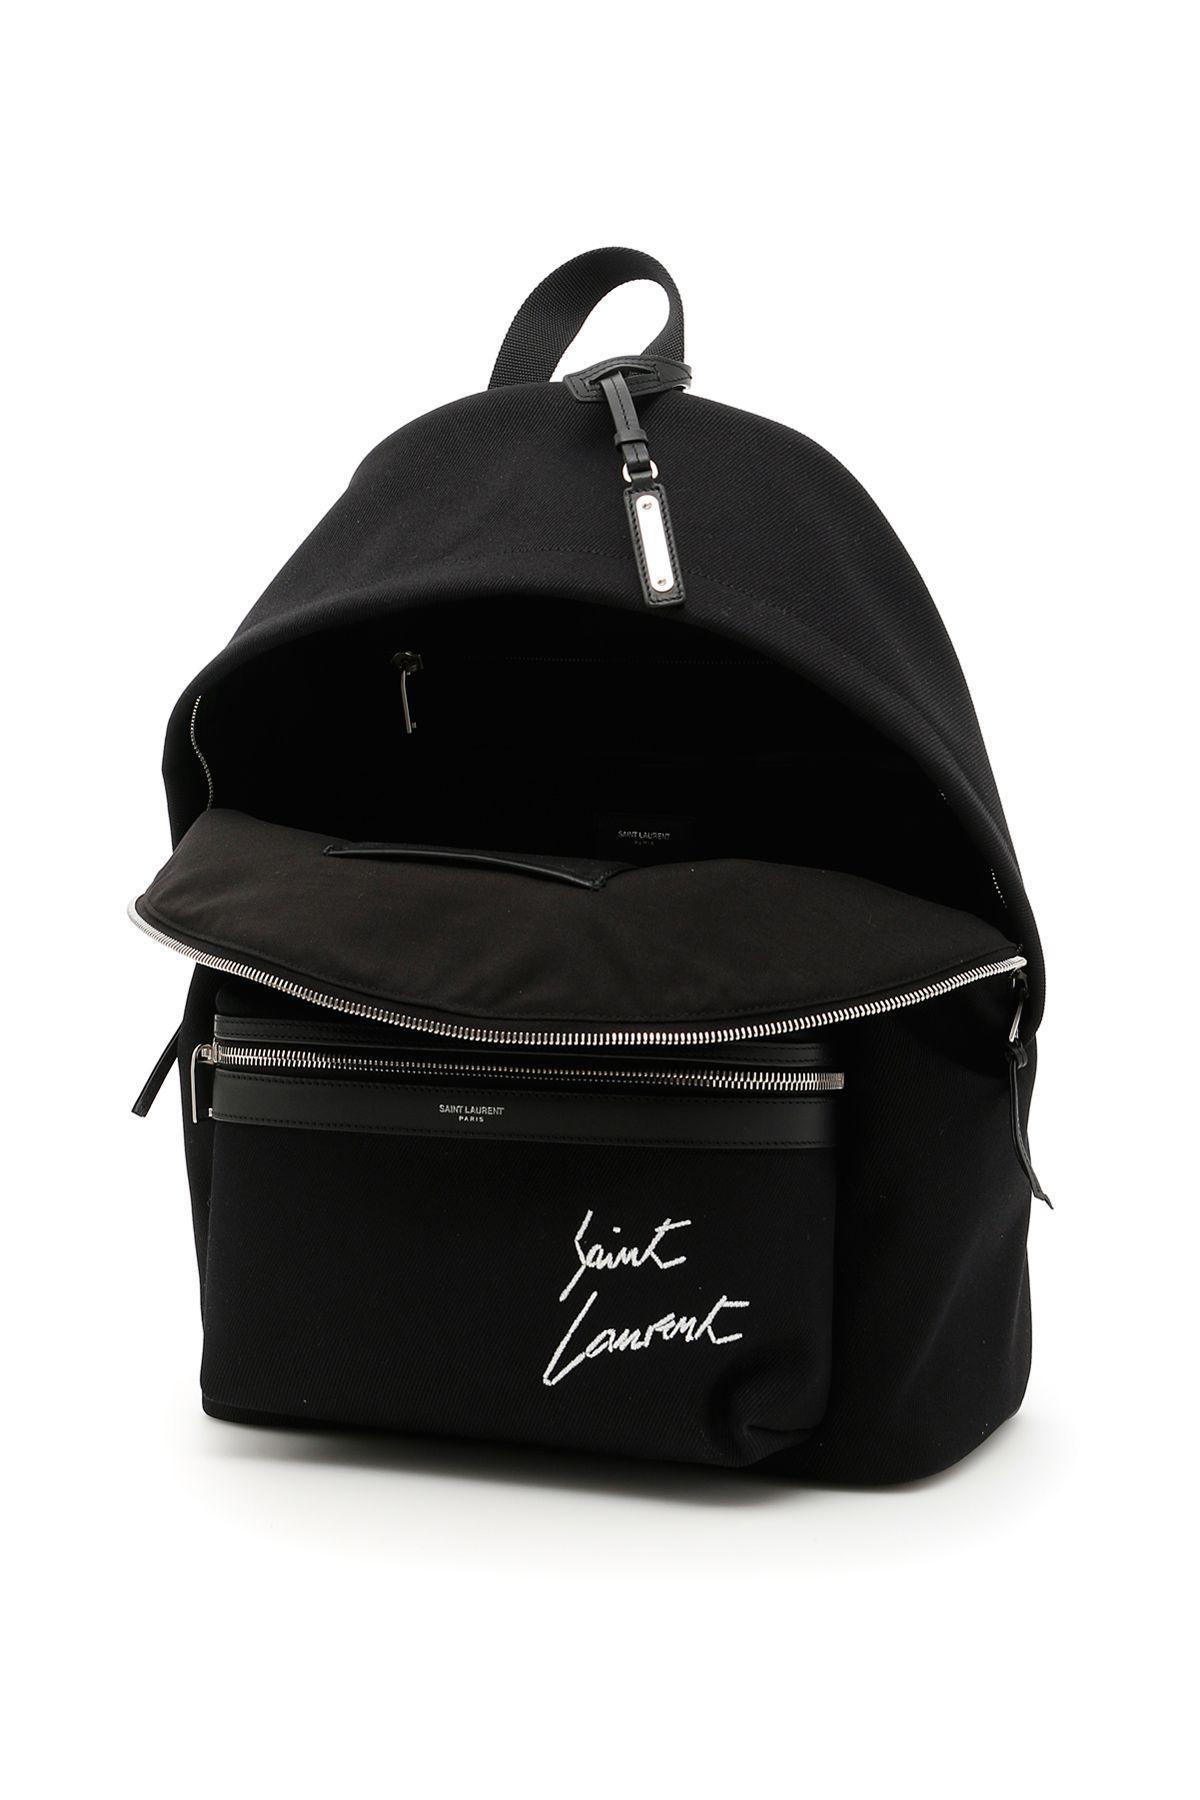 Saint Laurent Twill City Backpack In Noir-blancnero